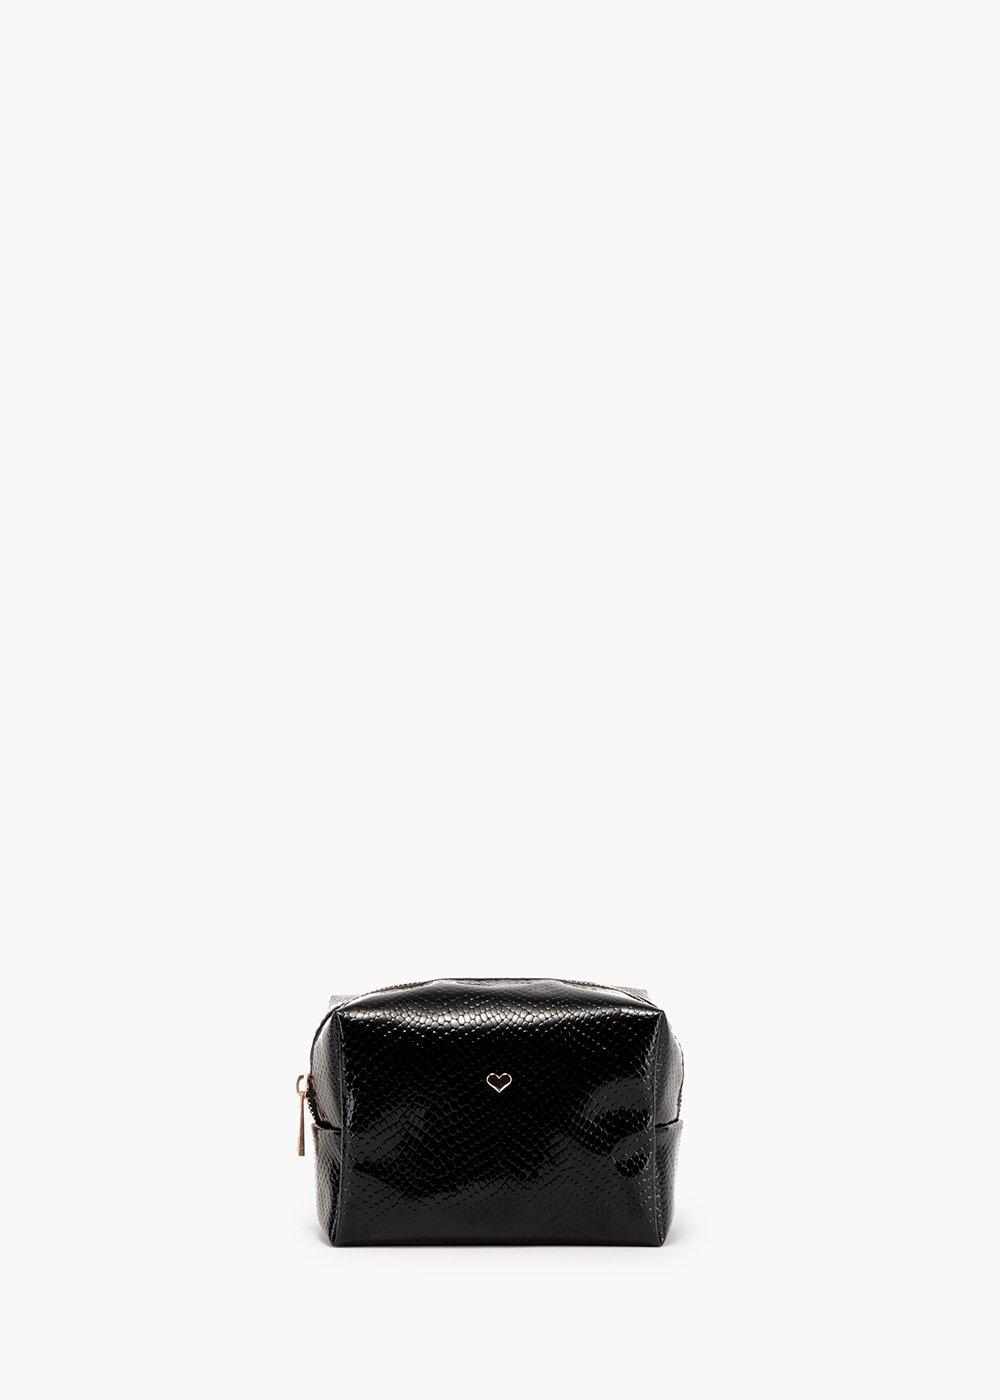 Beauty Blique in faux leather coconut print - Black - Woman